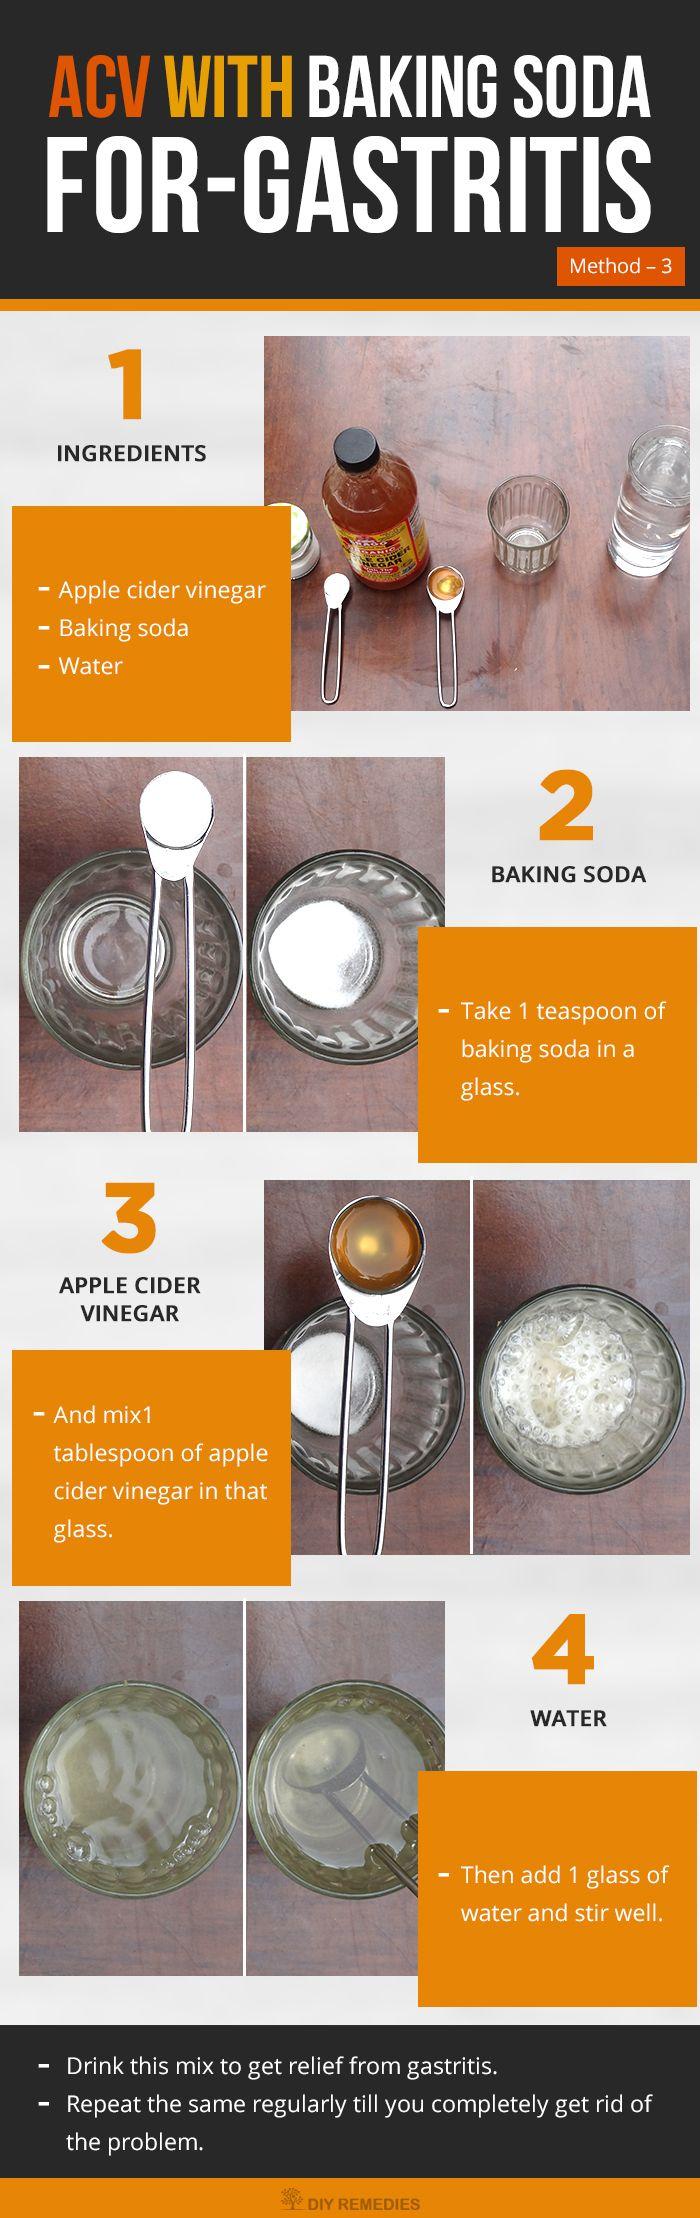 How to use Apple Cider Vinegar for Gastritis